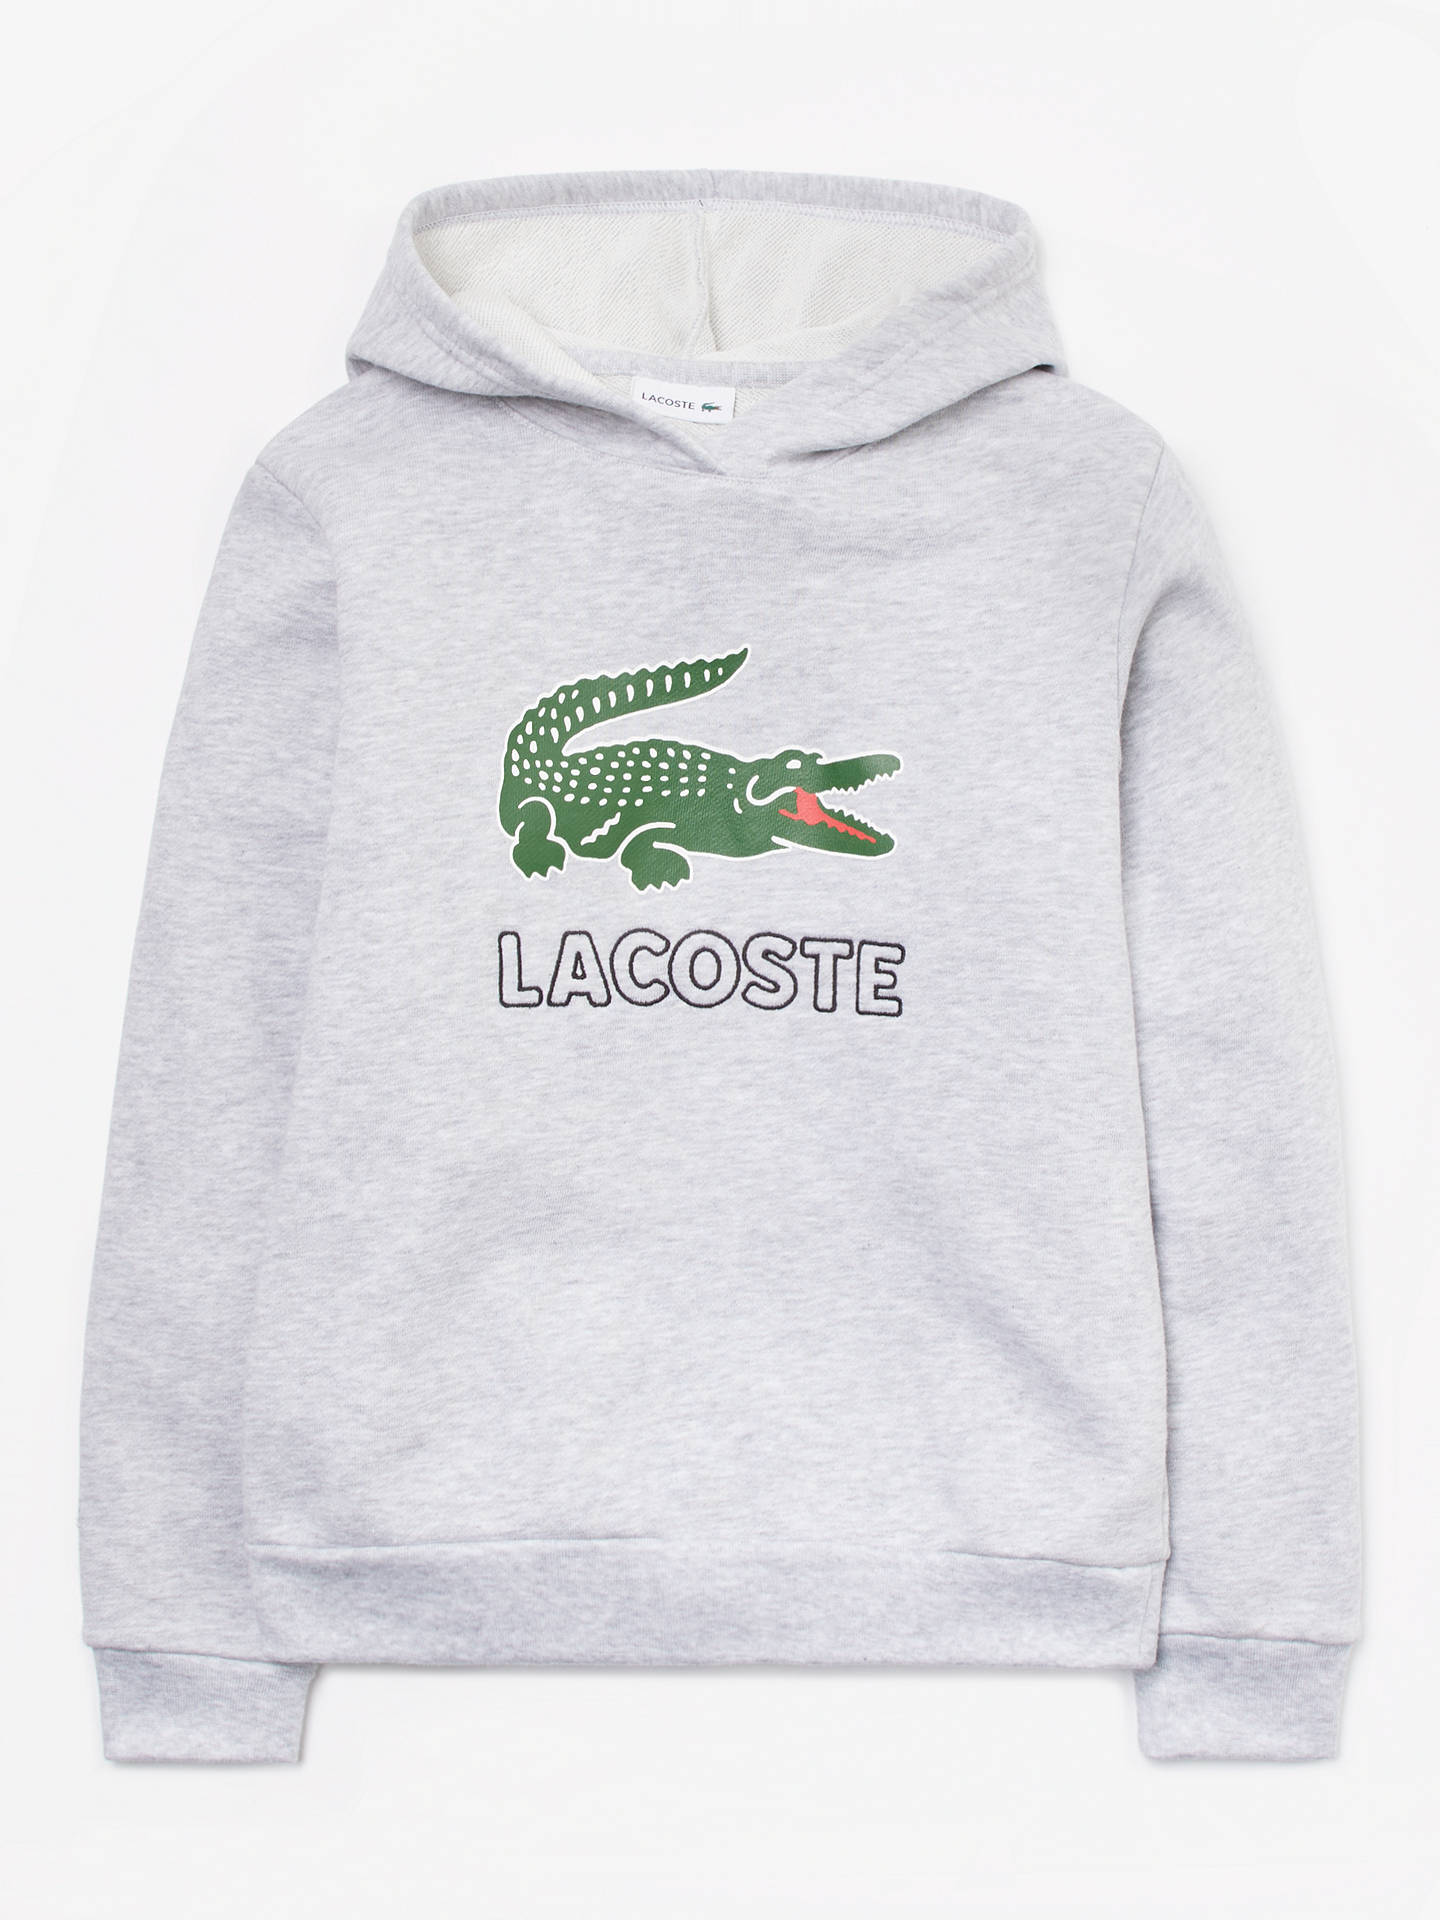 254f4e78 Buy Lacoste Boys' Logo Hoodie, Grey, 8 years Online at johnlewis. ...